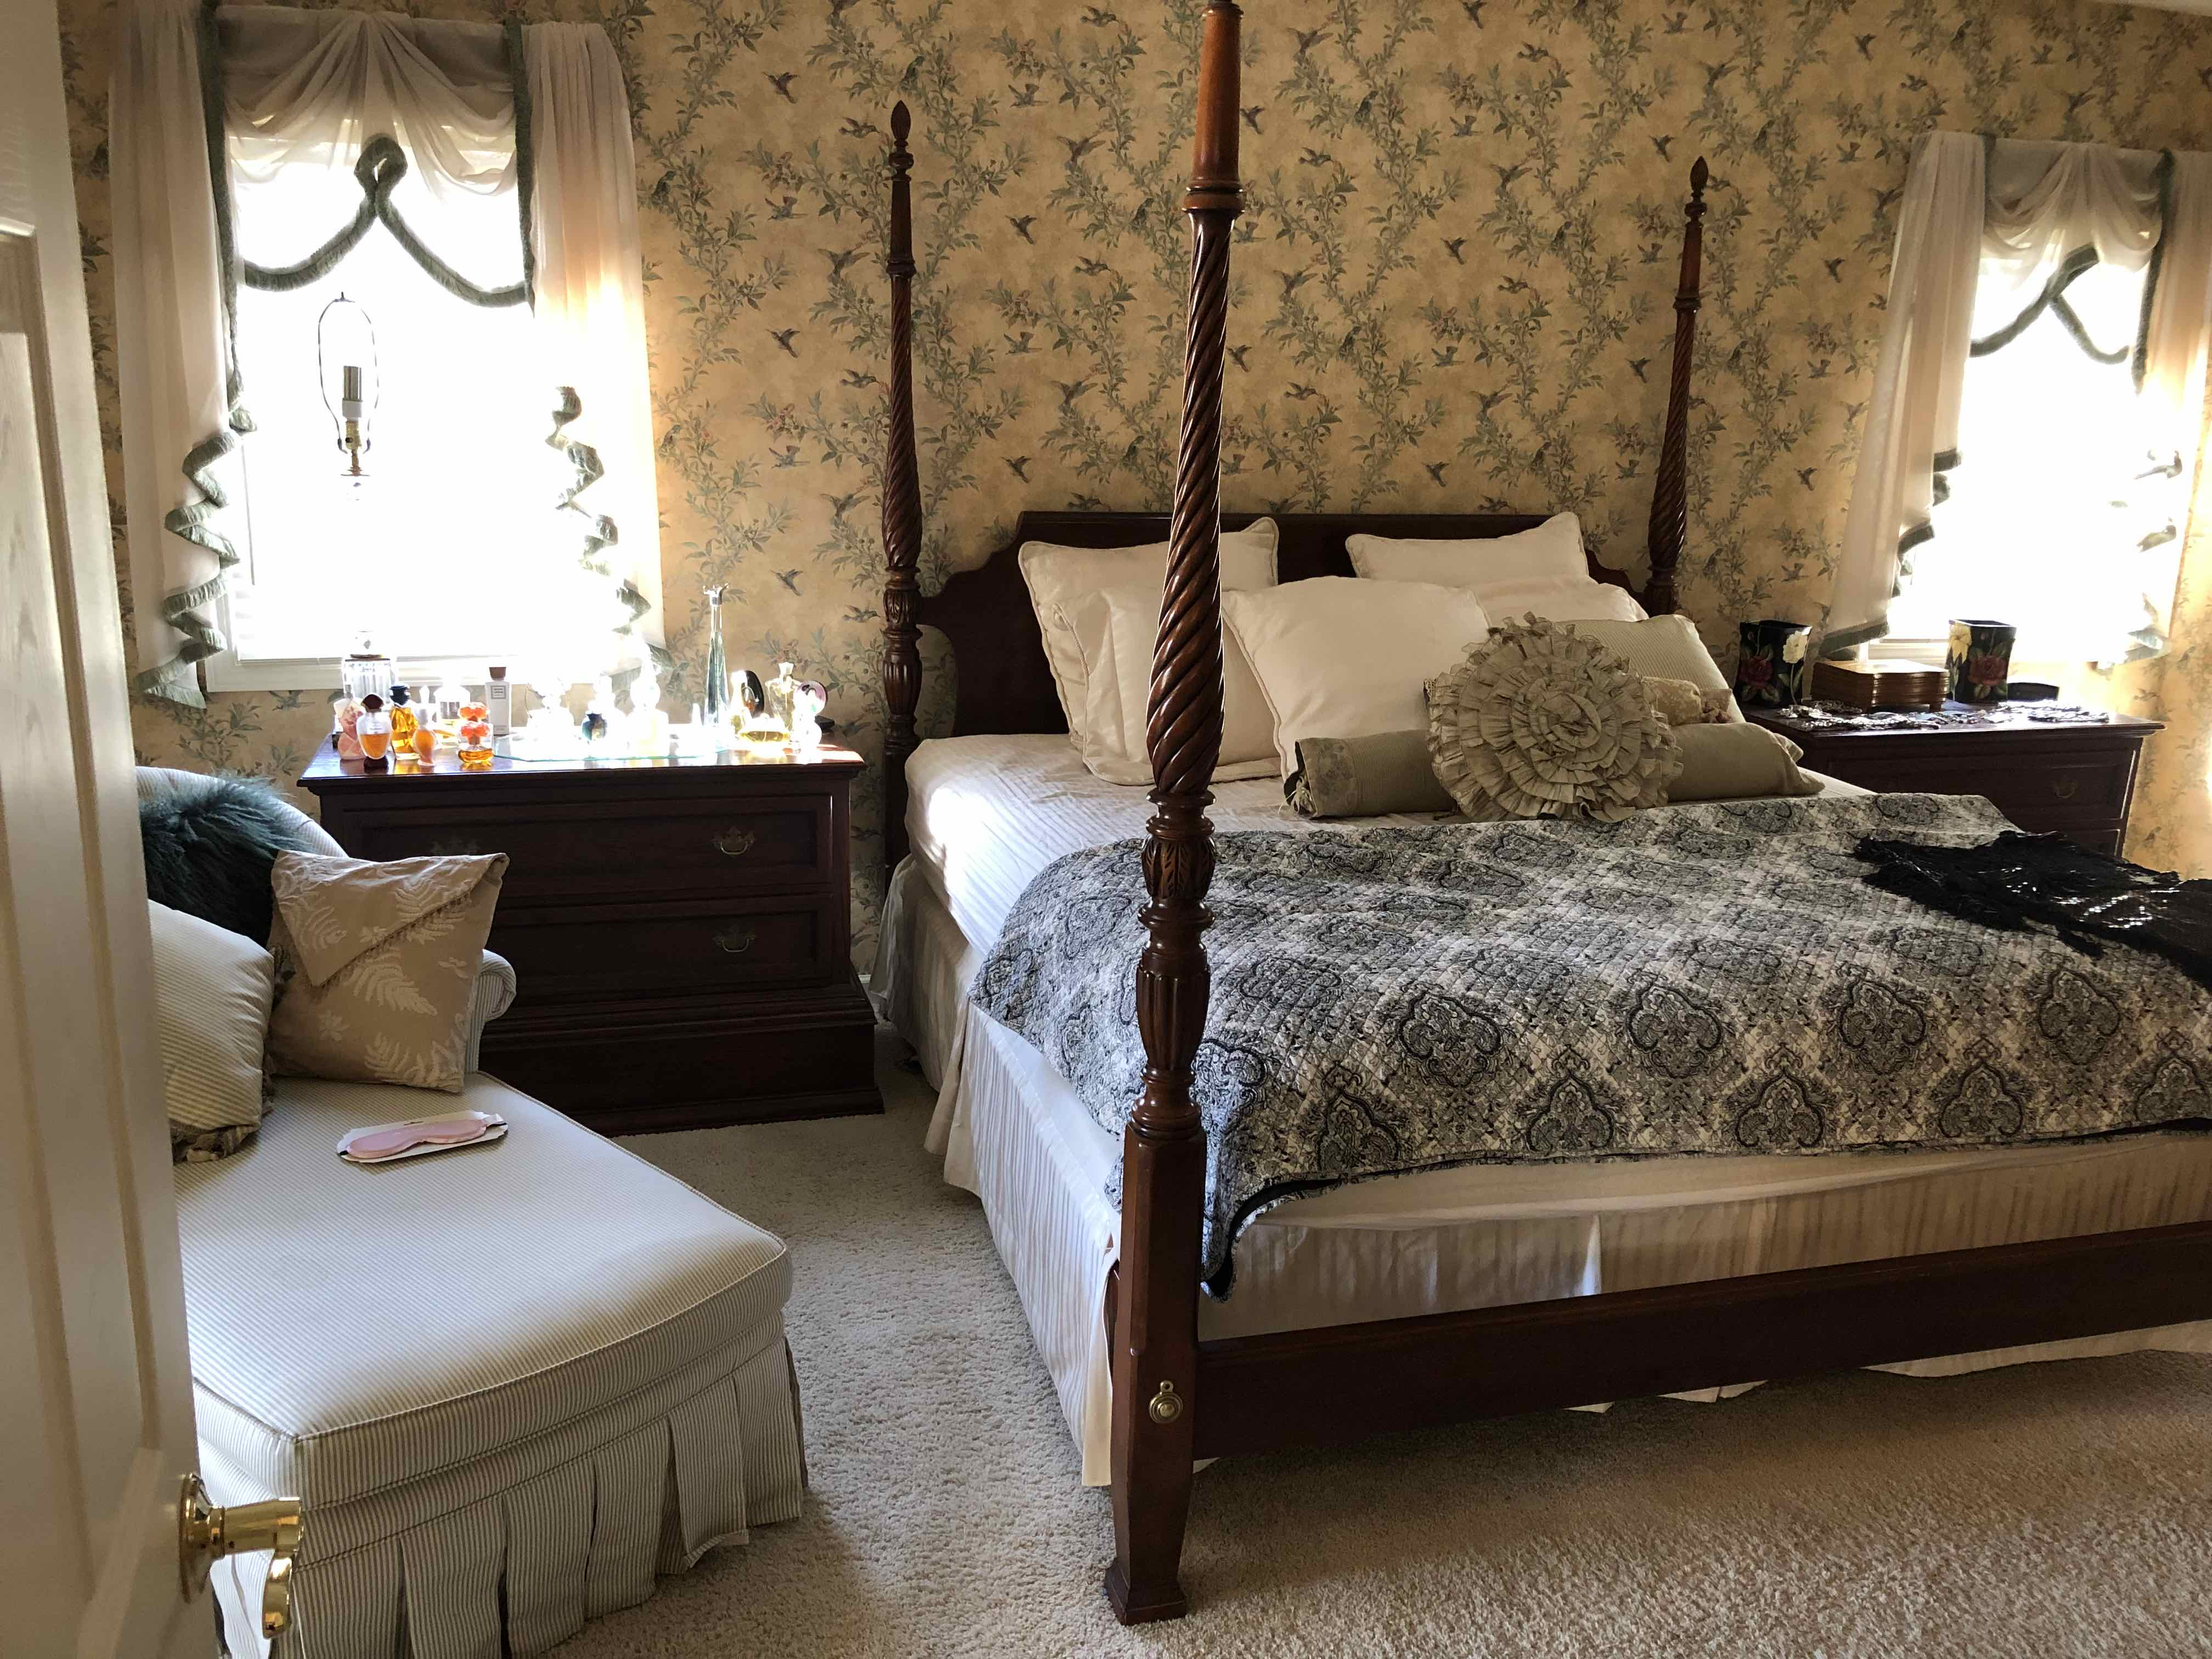 Designer Moving Sale In Chagrin Highlands Solon Ohio L